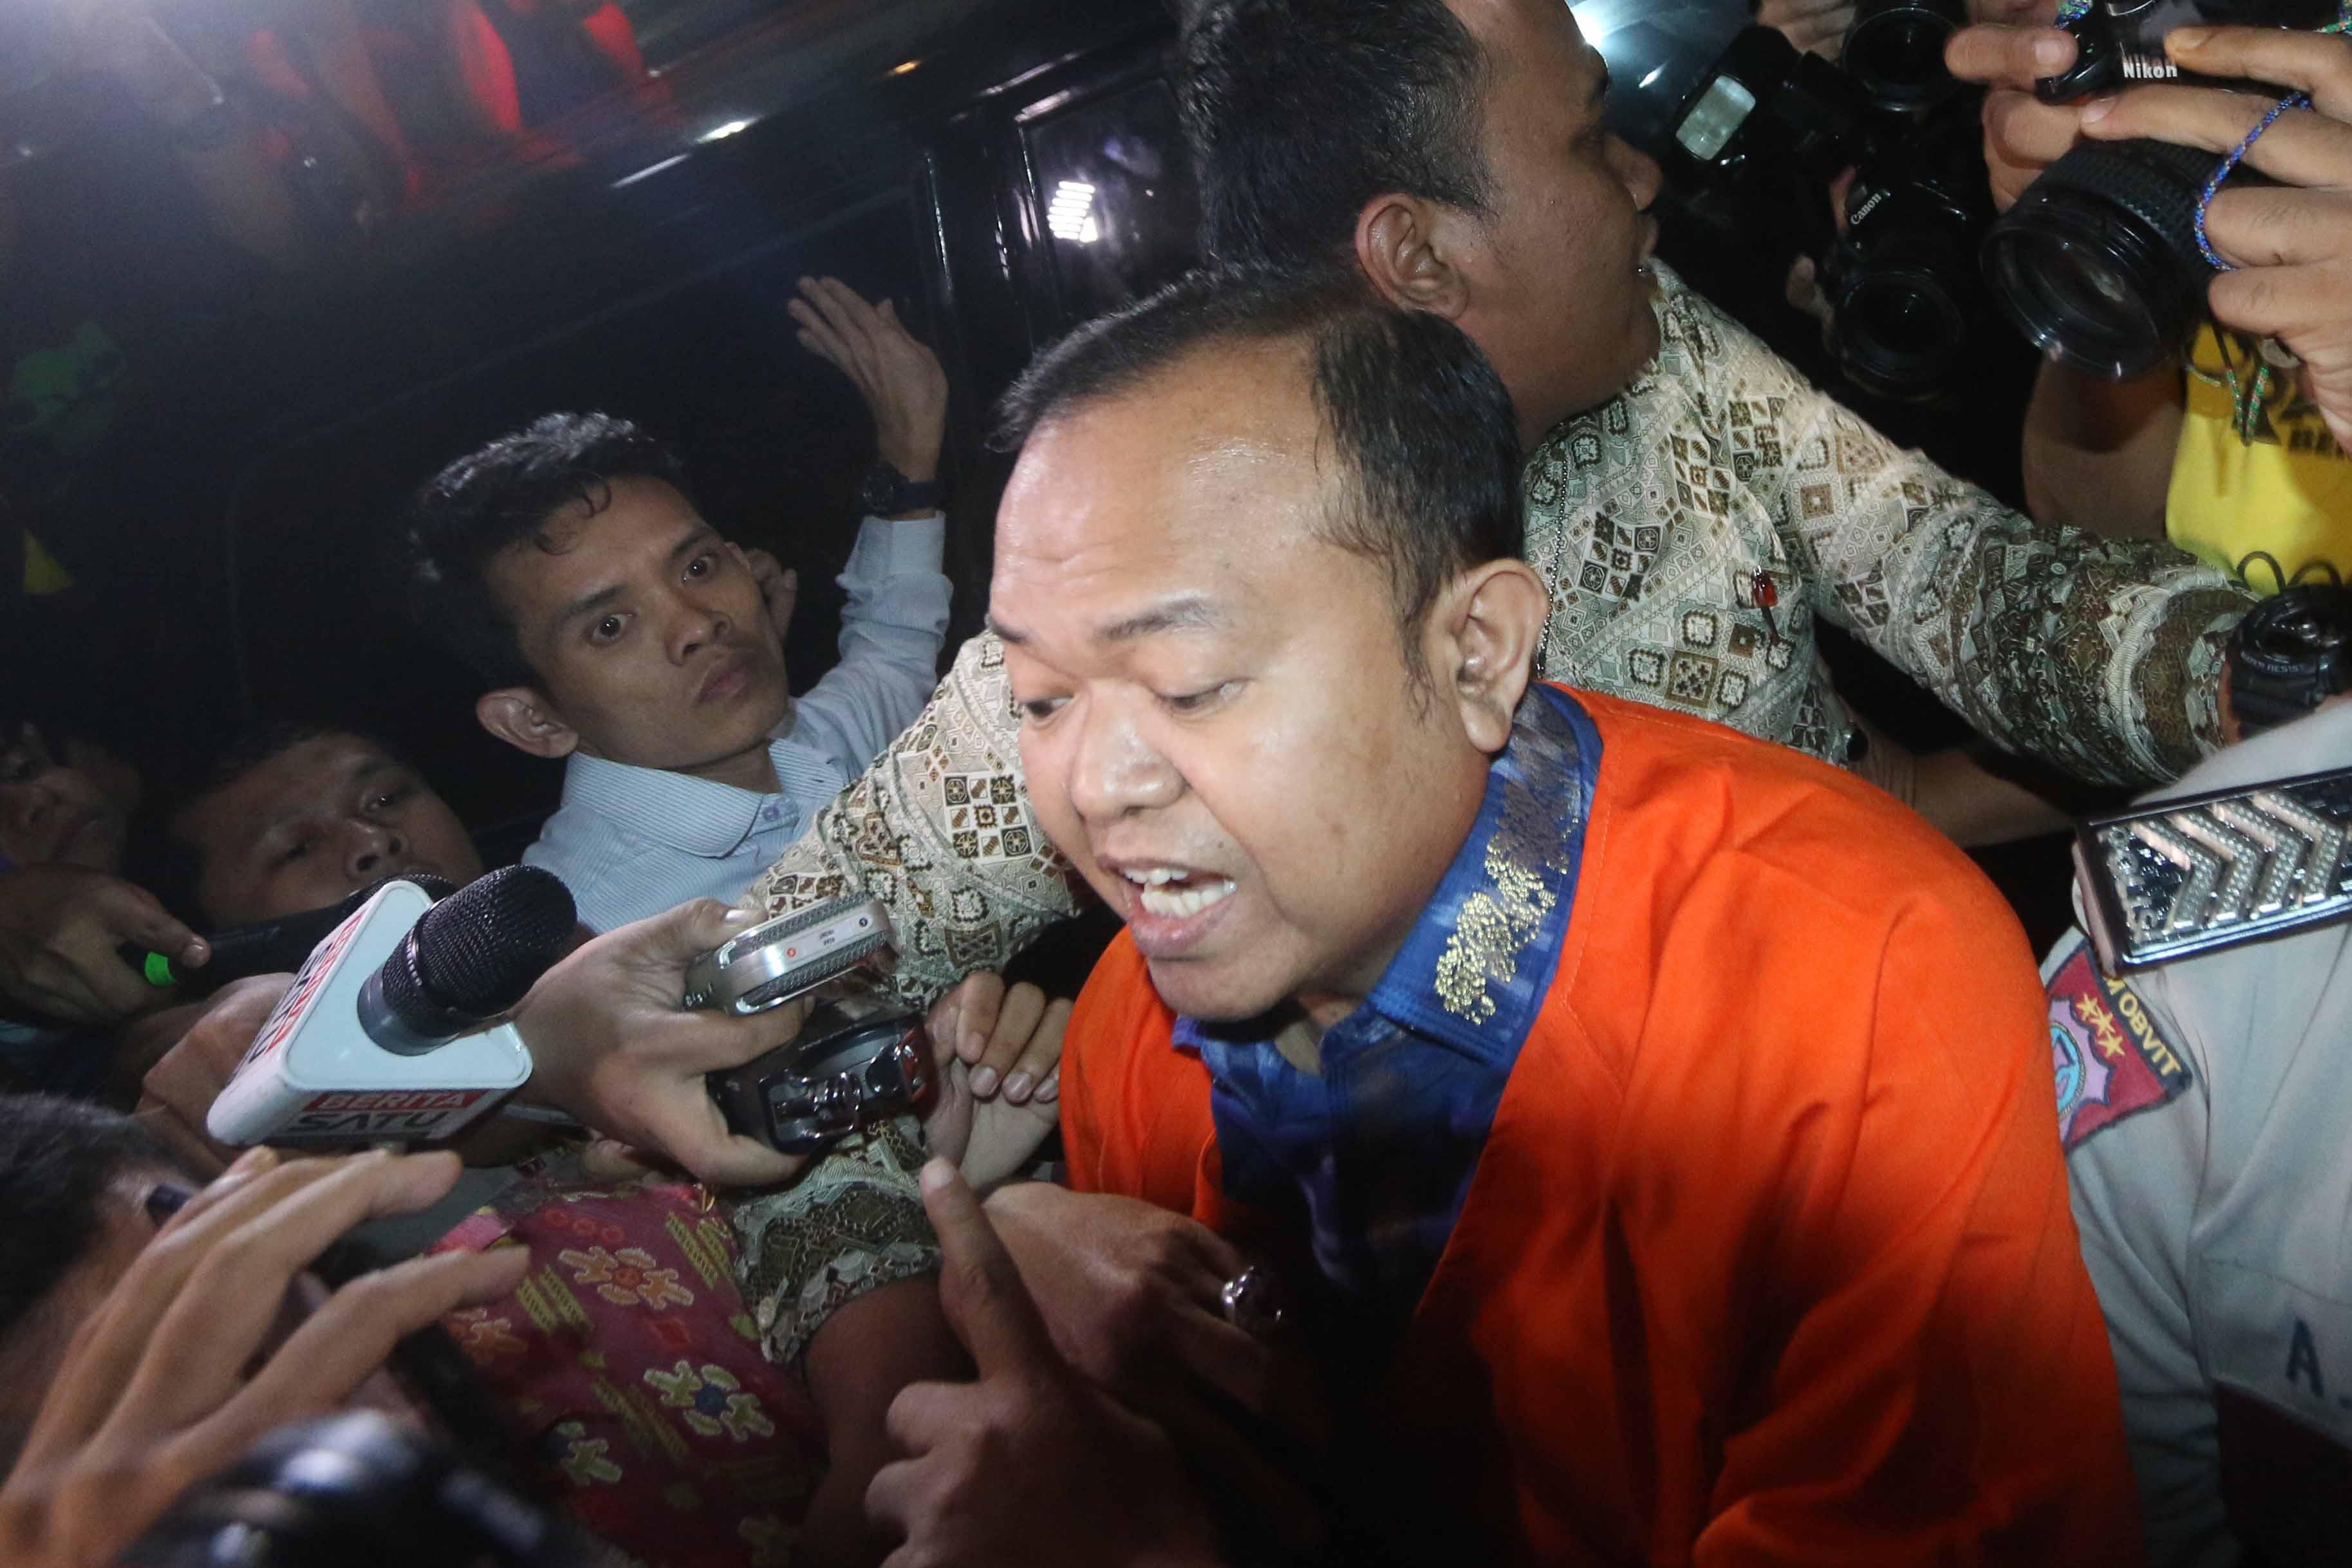 ROMPI ORANYE. Mantan Sekjen Partai Nasional Demokrat Patrice Rio Capella resmi ditahan Komisi Pemberantasan Korupsi usai menjalani pemeriksaan di gedung KPK, Jakarta, Jumat, 23 Oktober.